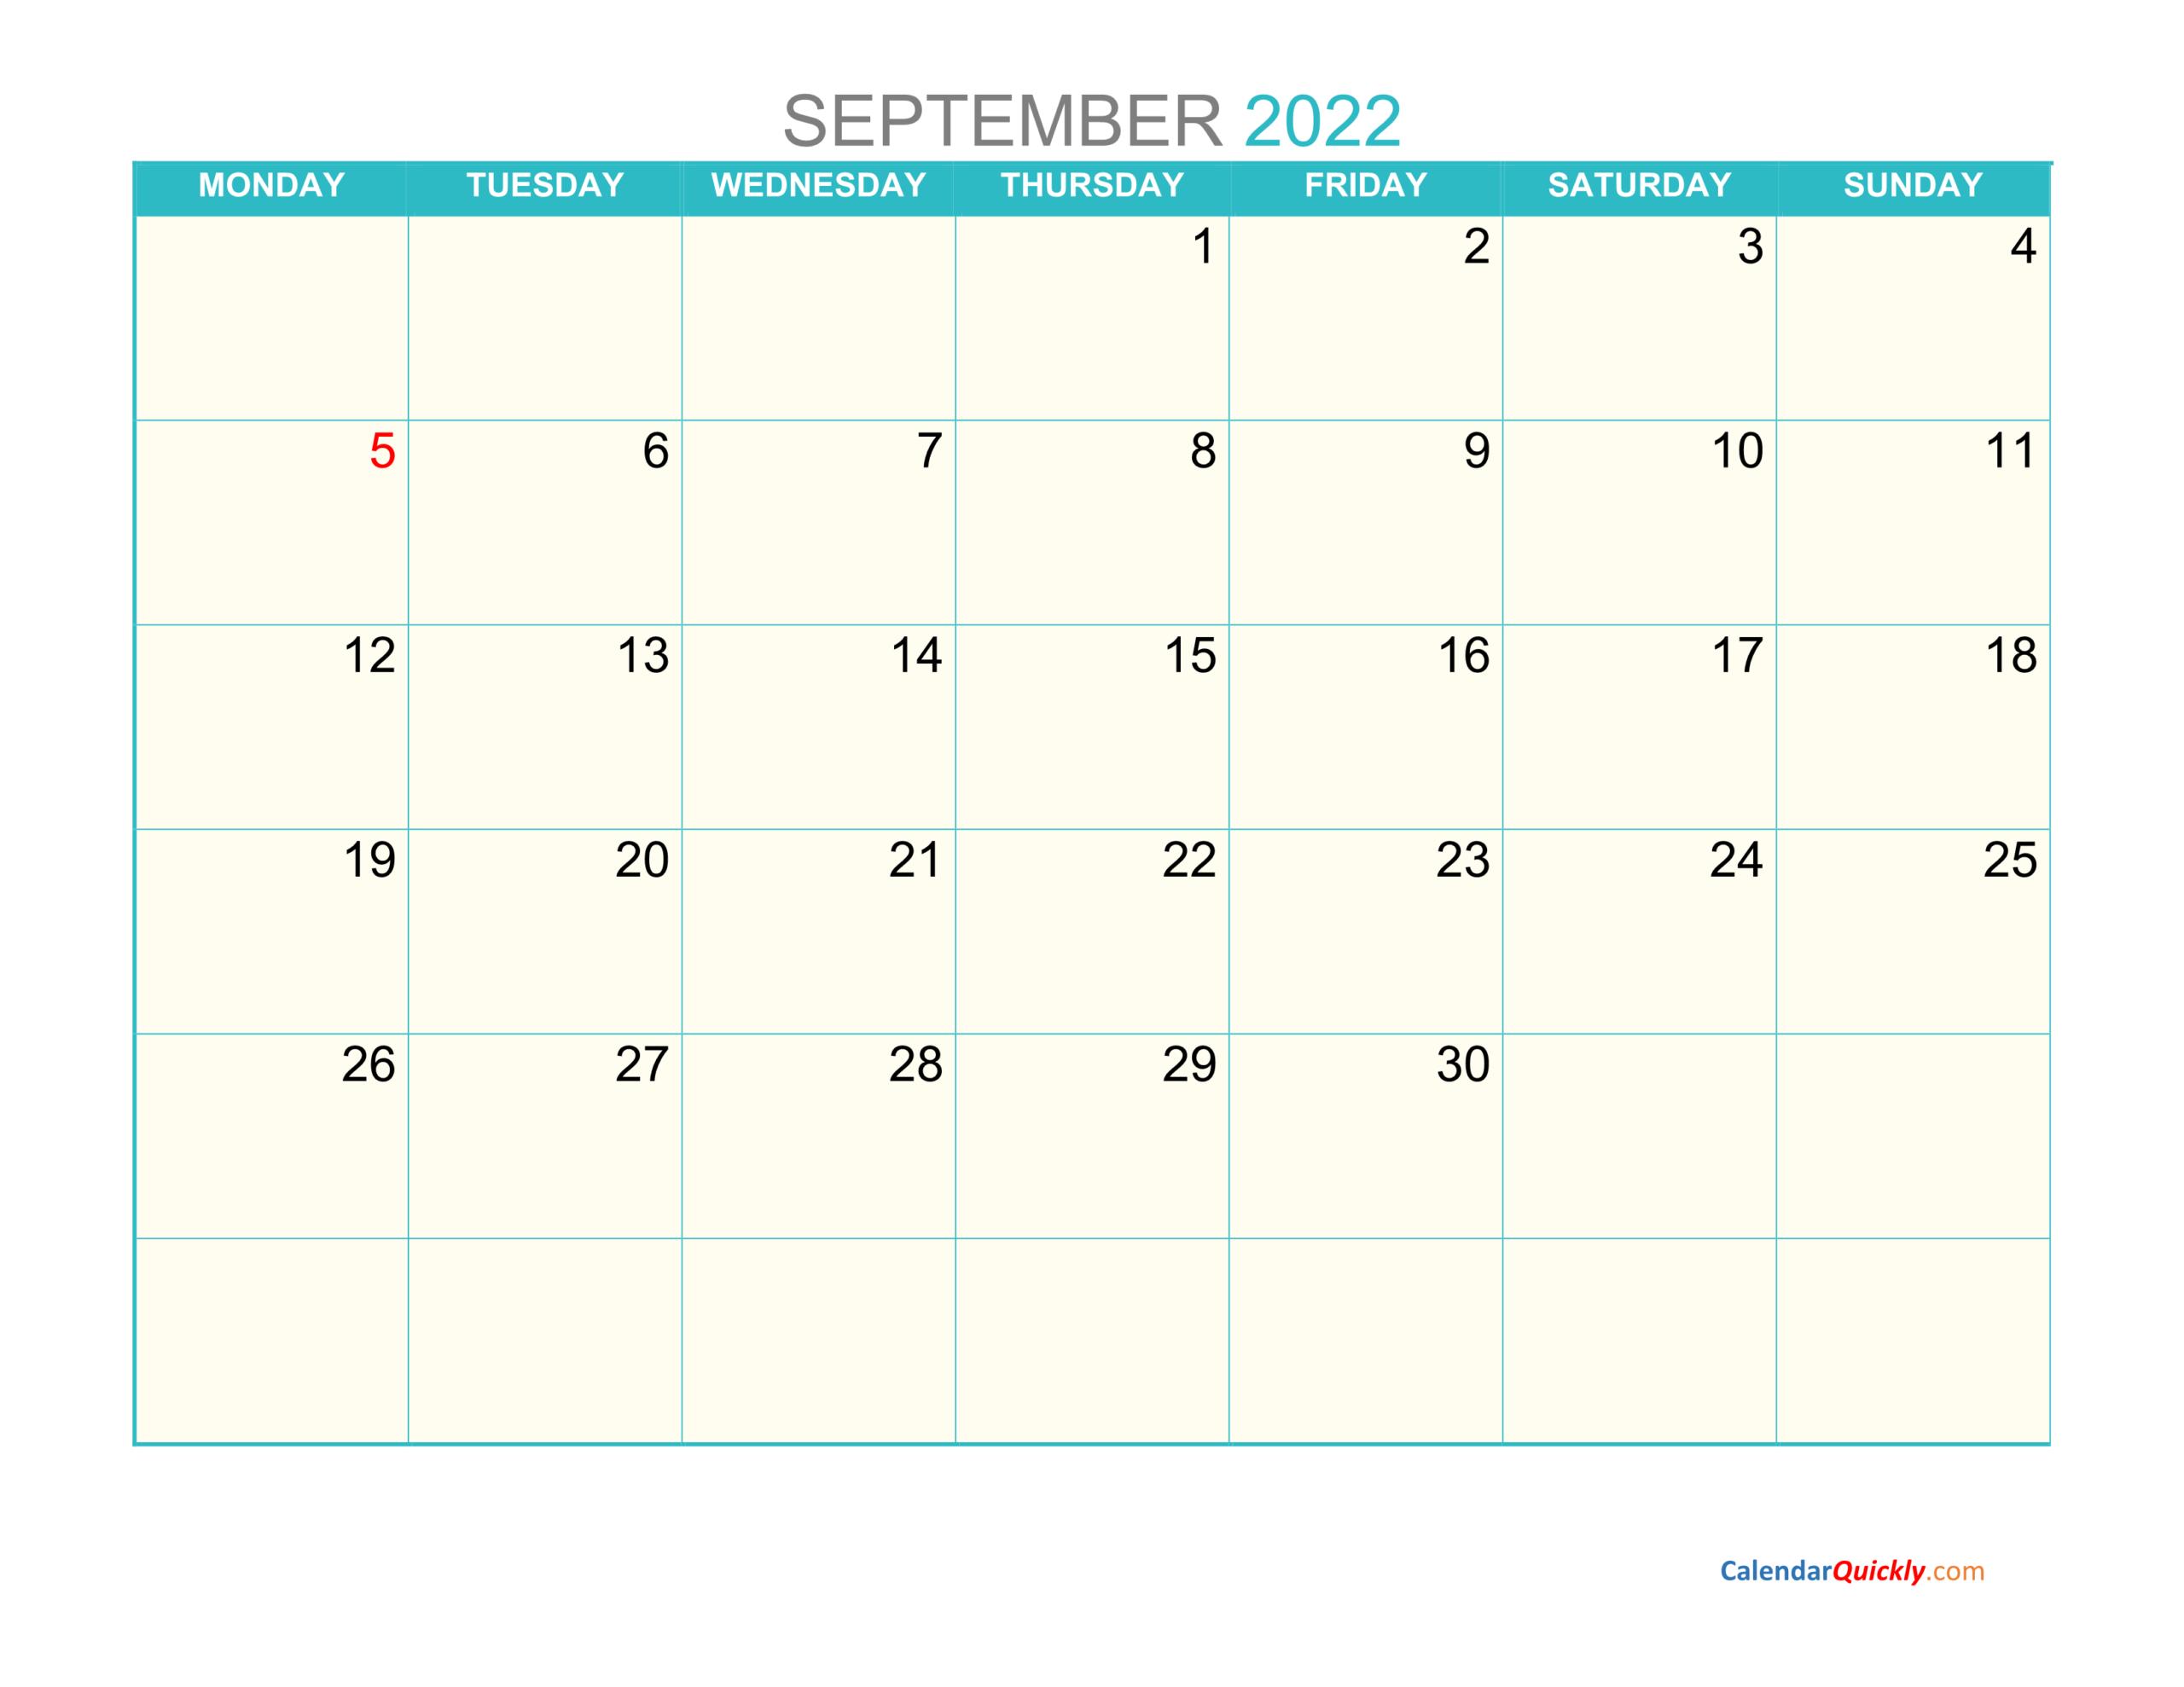 September Monday 2022 Calendar Printable | Calendar Quickly with regard to Print Month Calendar September 2022